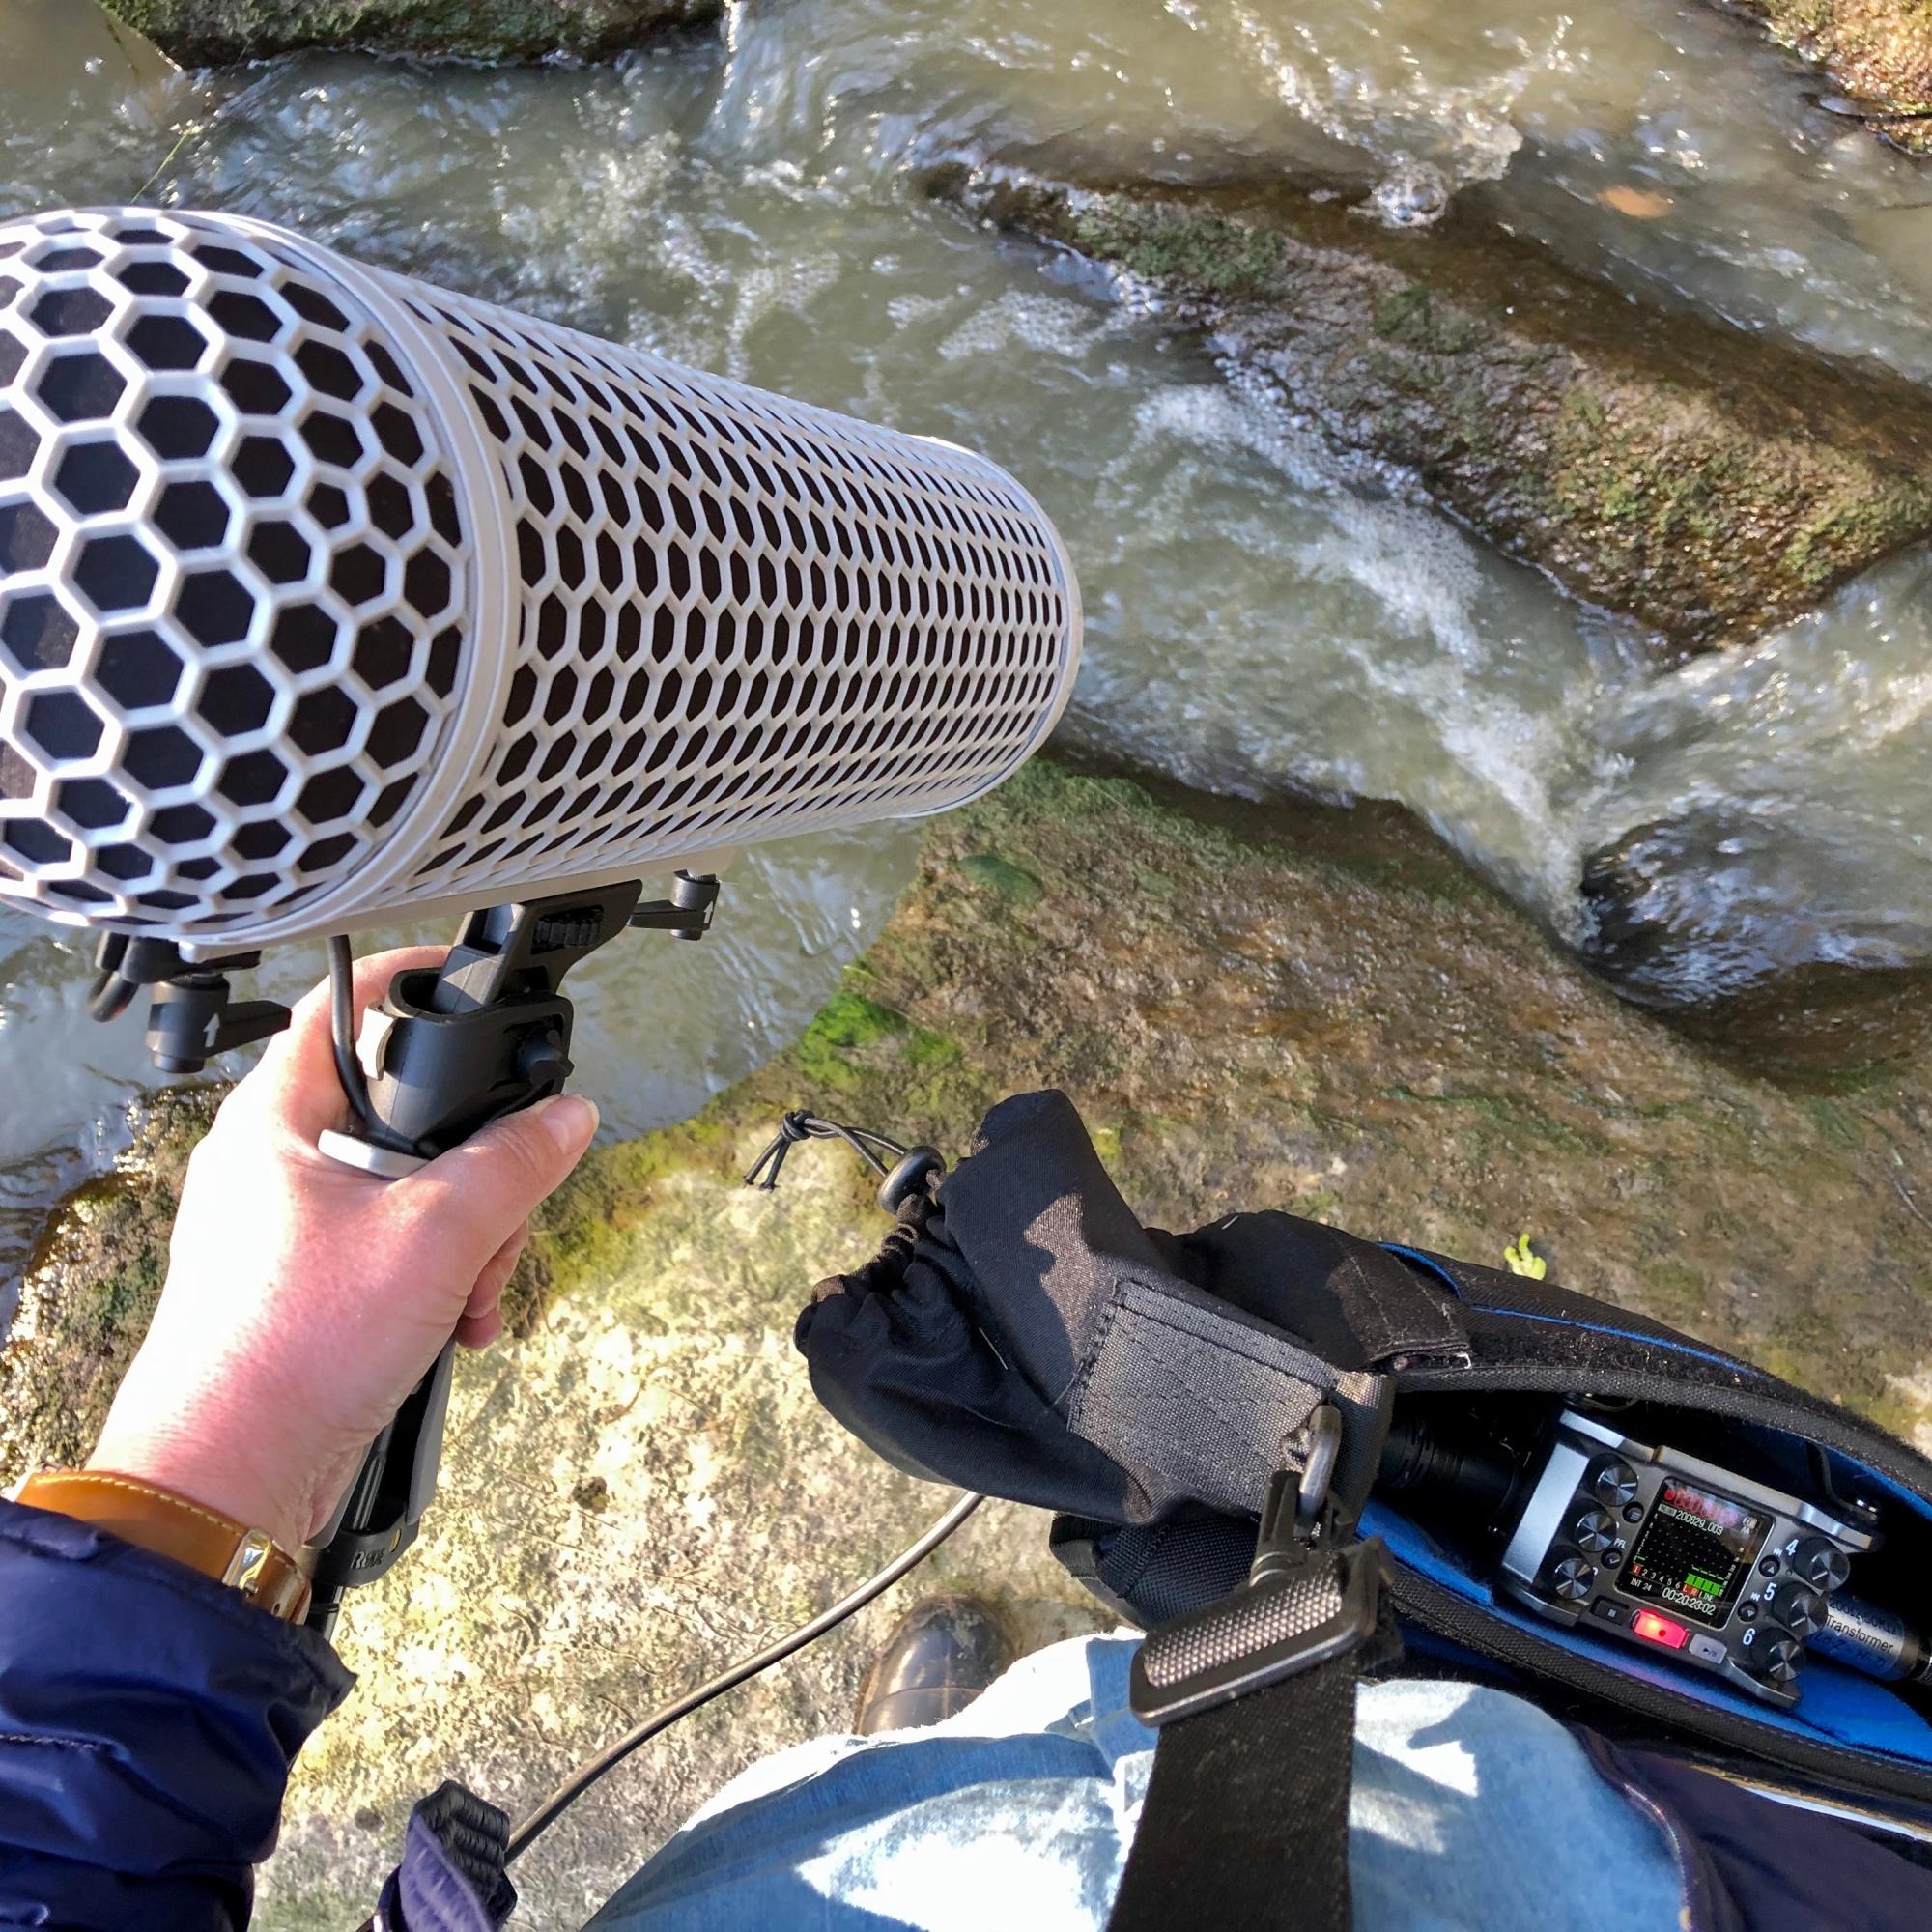 Field recording with Kim V. Goldsmith